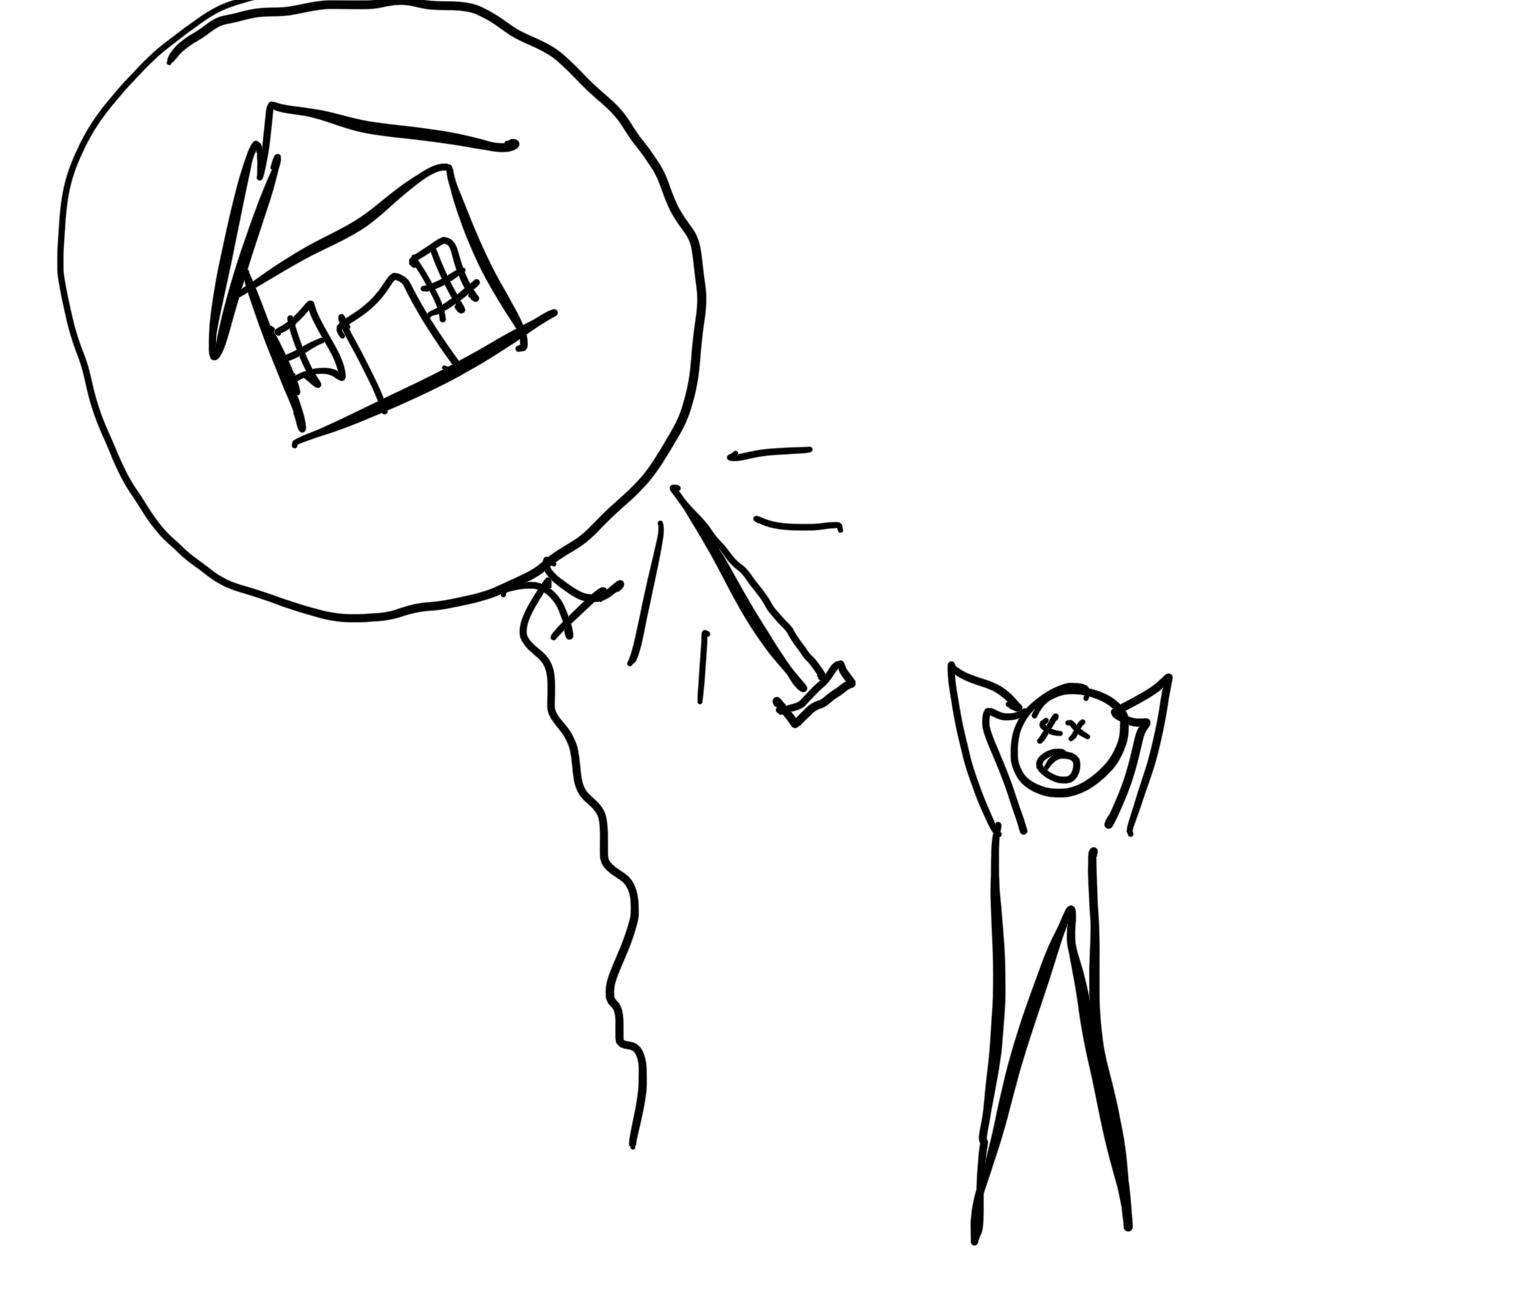 PVDB housing bubble pop